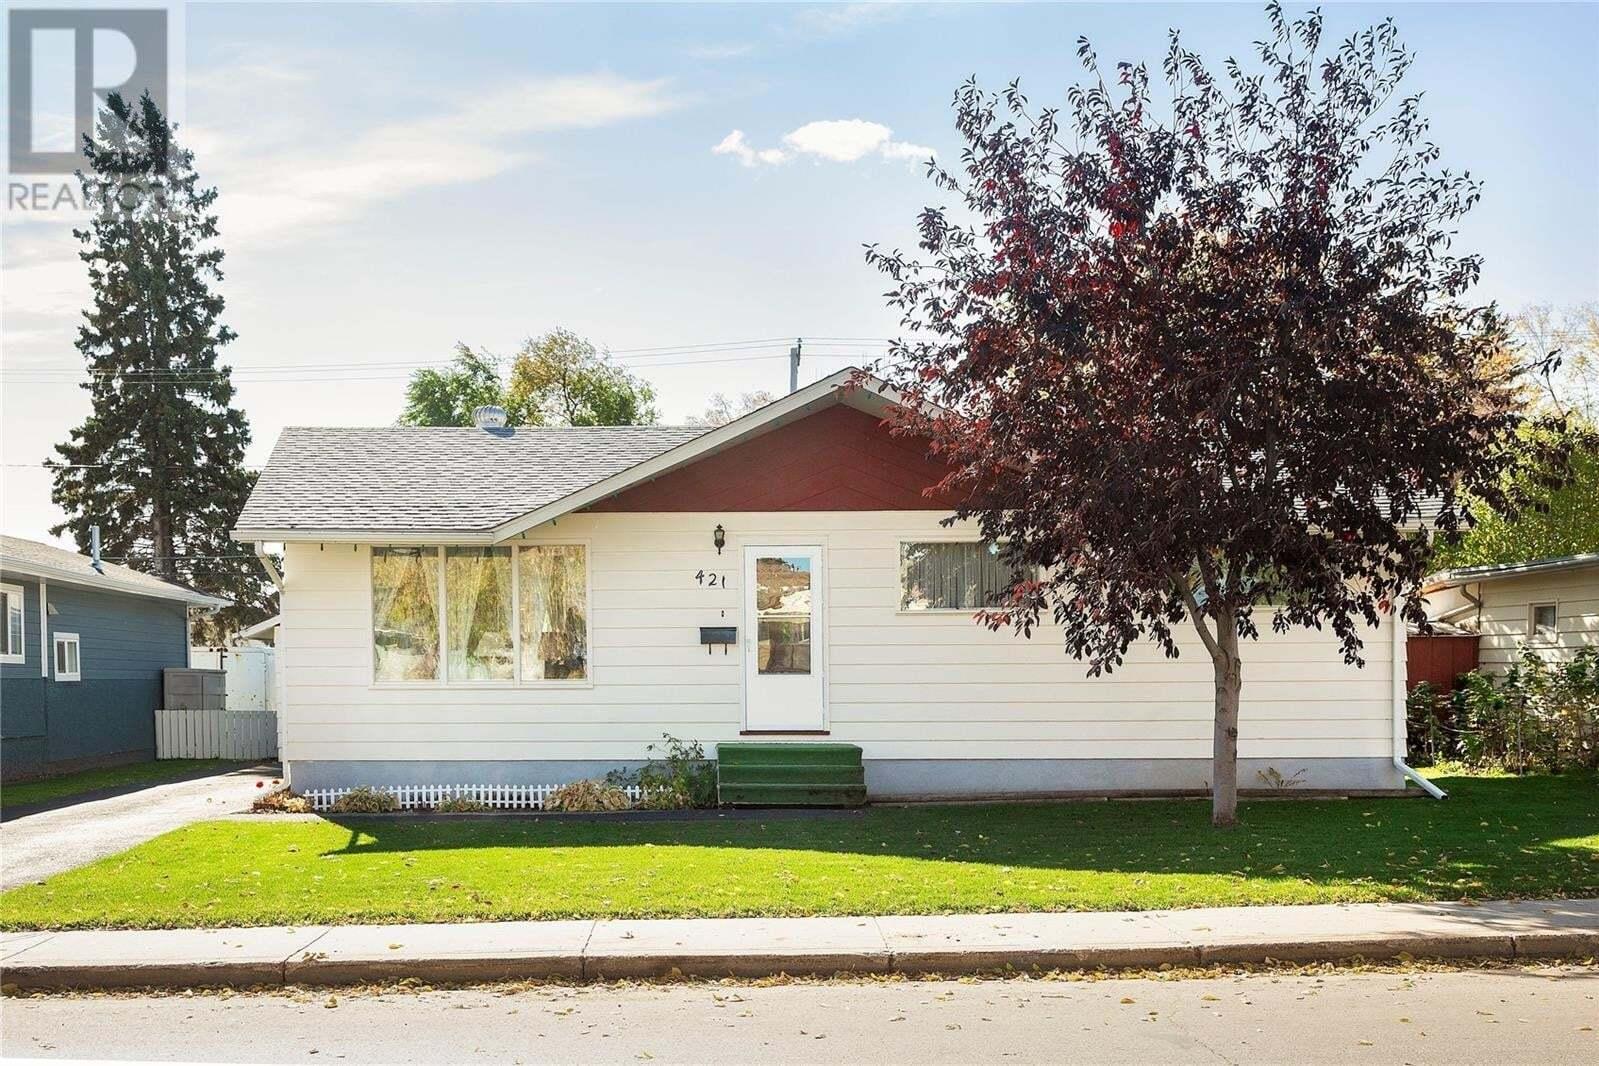 House for sale at 421 22nd St E Prince Albert Saskatchewan - MLS: SK828874